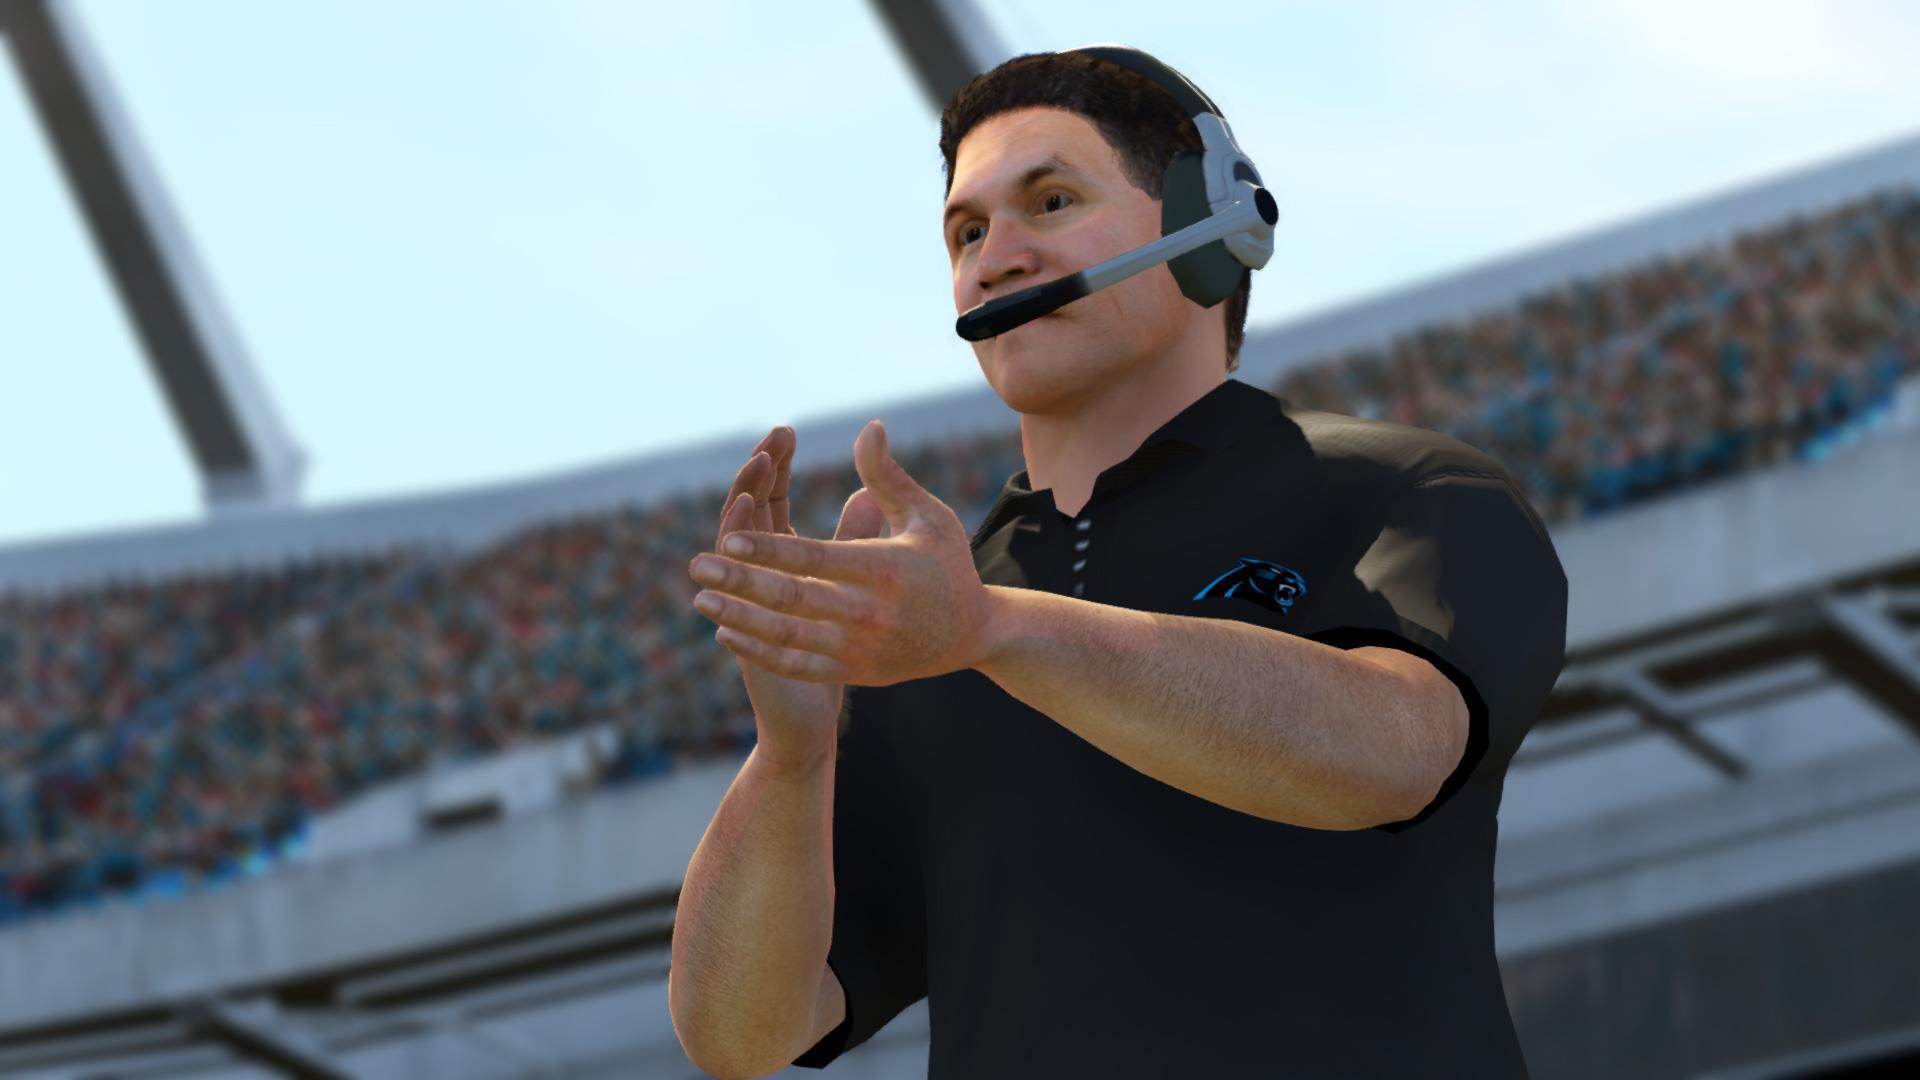 Ron Rivera Legacy Award in Madden NFL 25 (Xbox One)